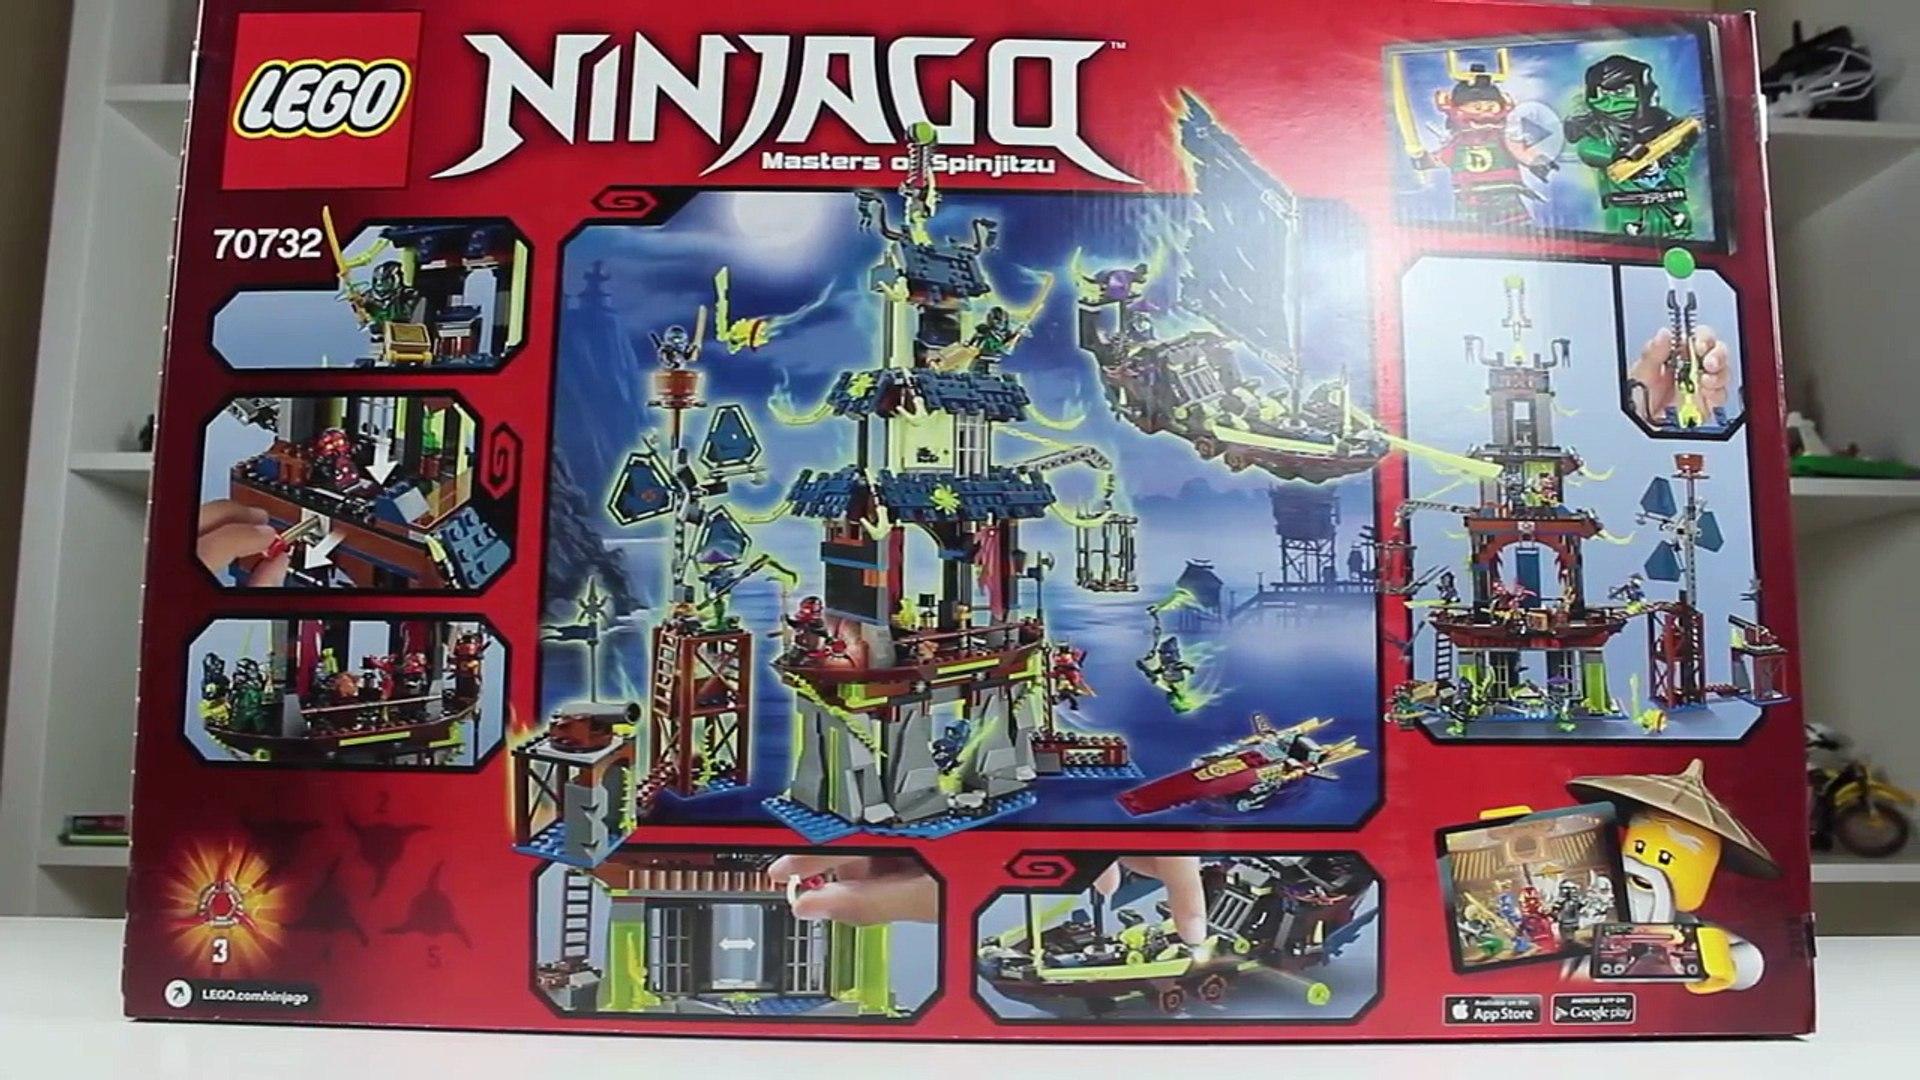 Lego Ninjago 70732 Город Стикс (City Of Stiix) новинка 2015!